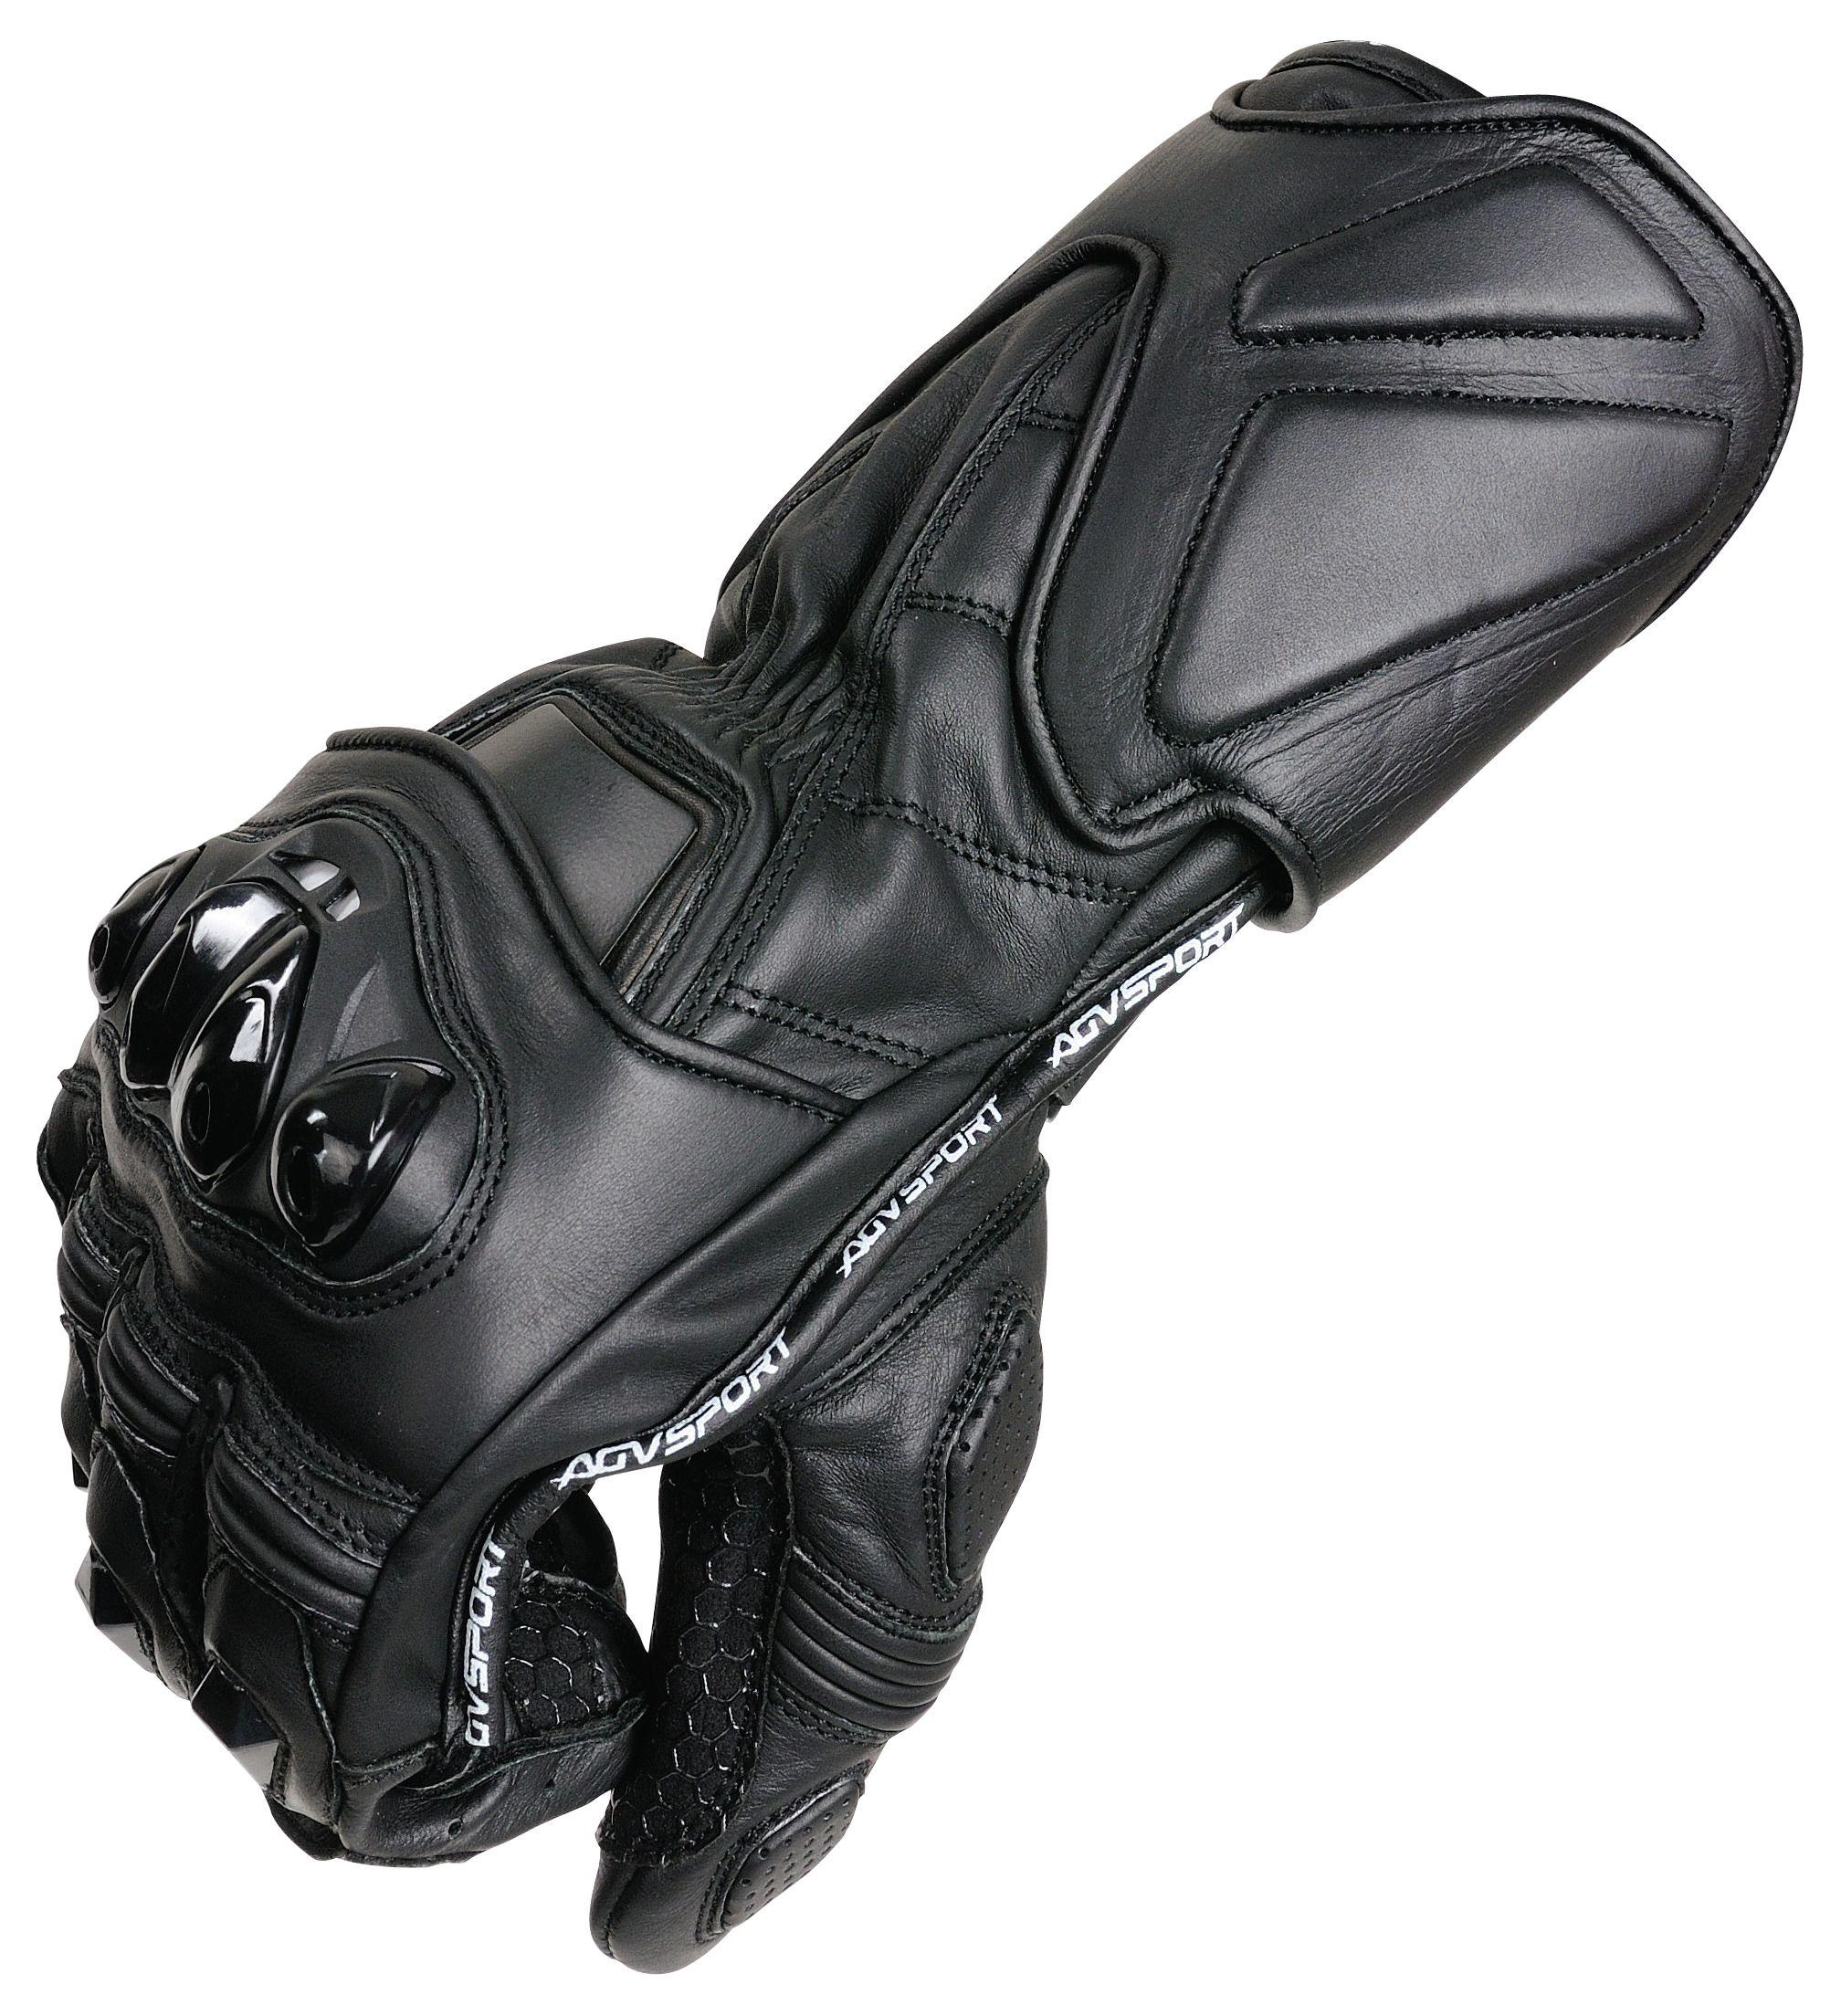 Leather gauntlet driving gloves - Leather Gauntlet Driving Gloves 22